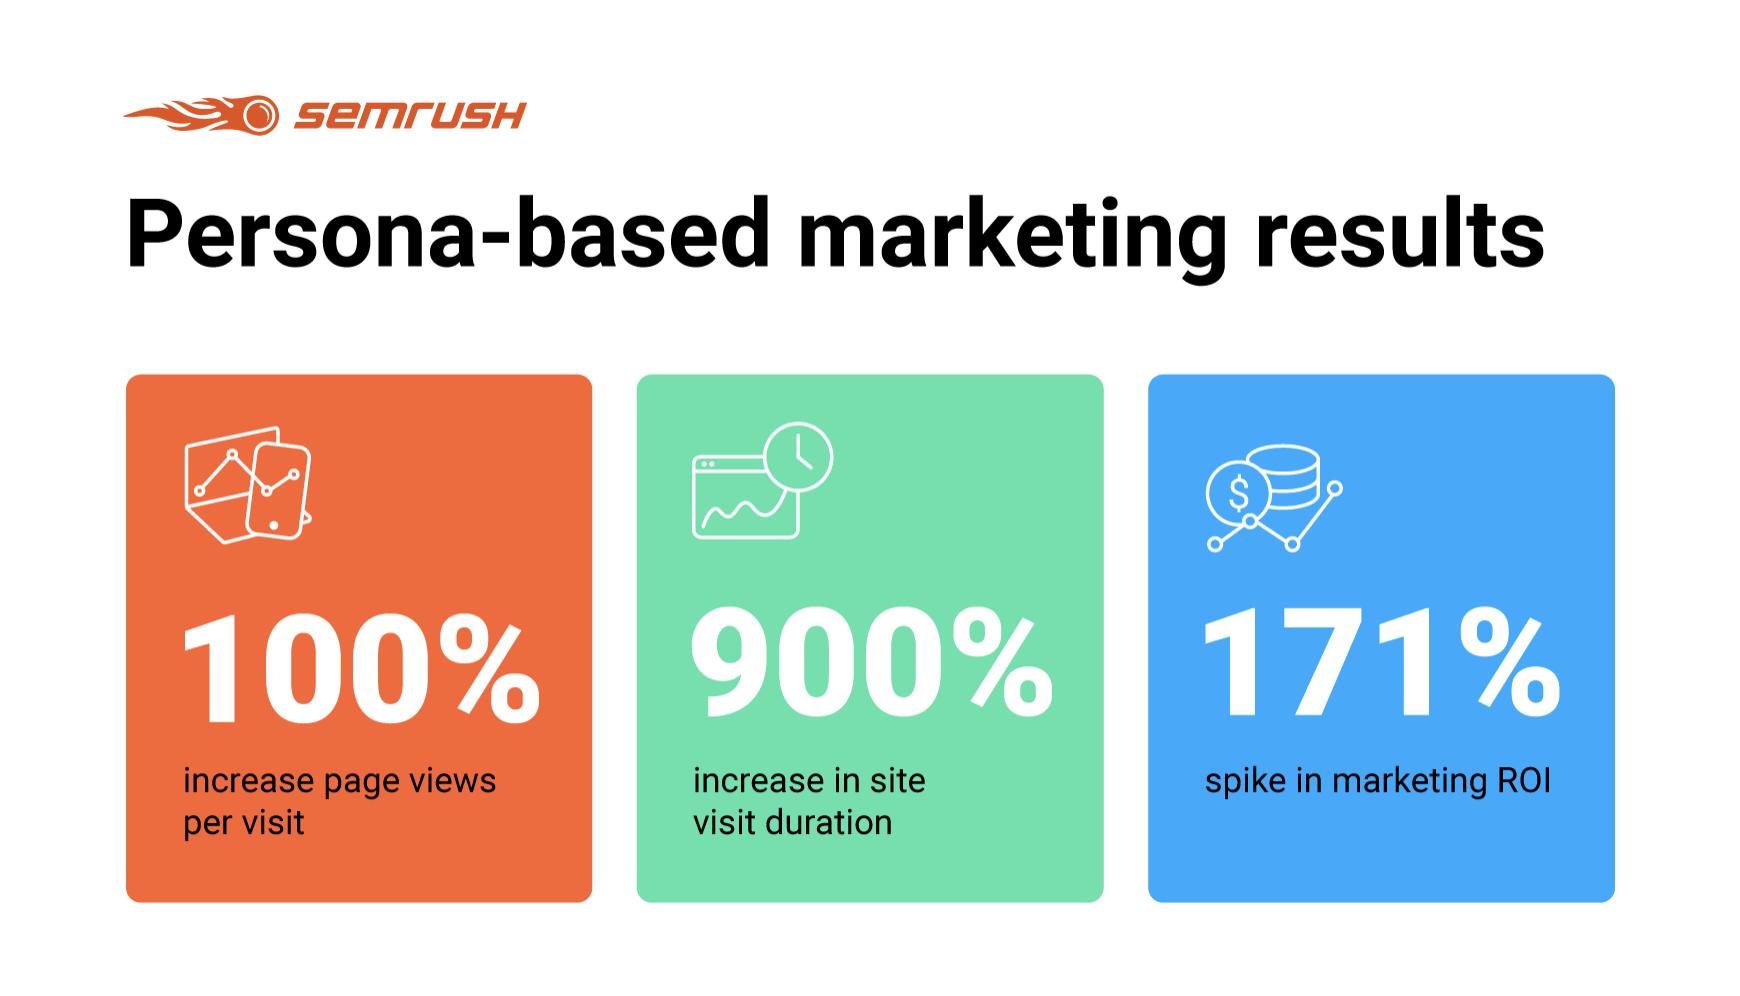 SEMrush persona-based marketing infographic